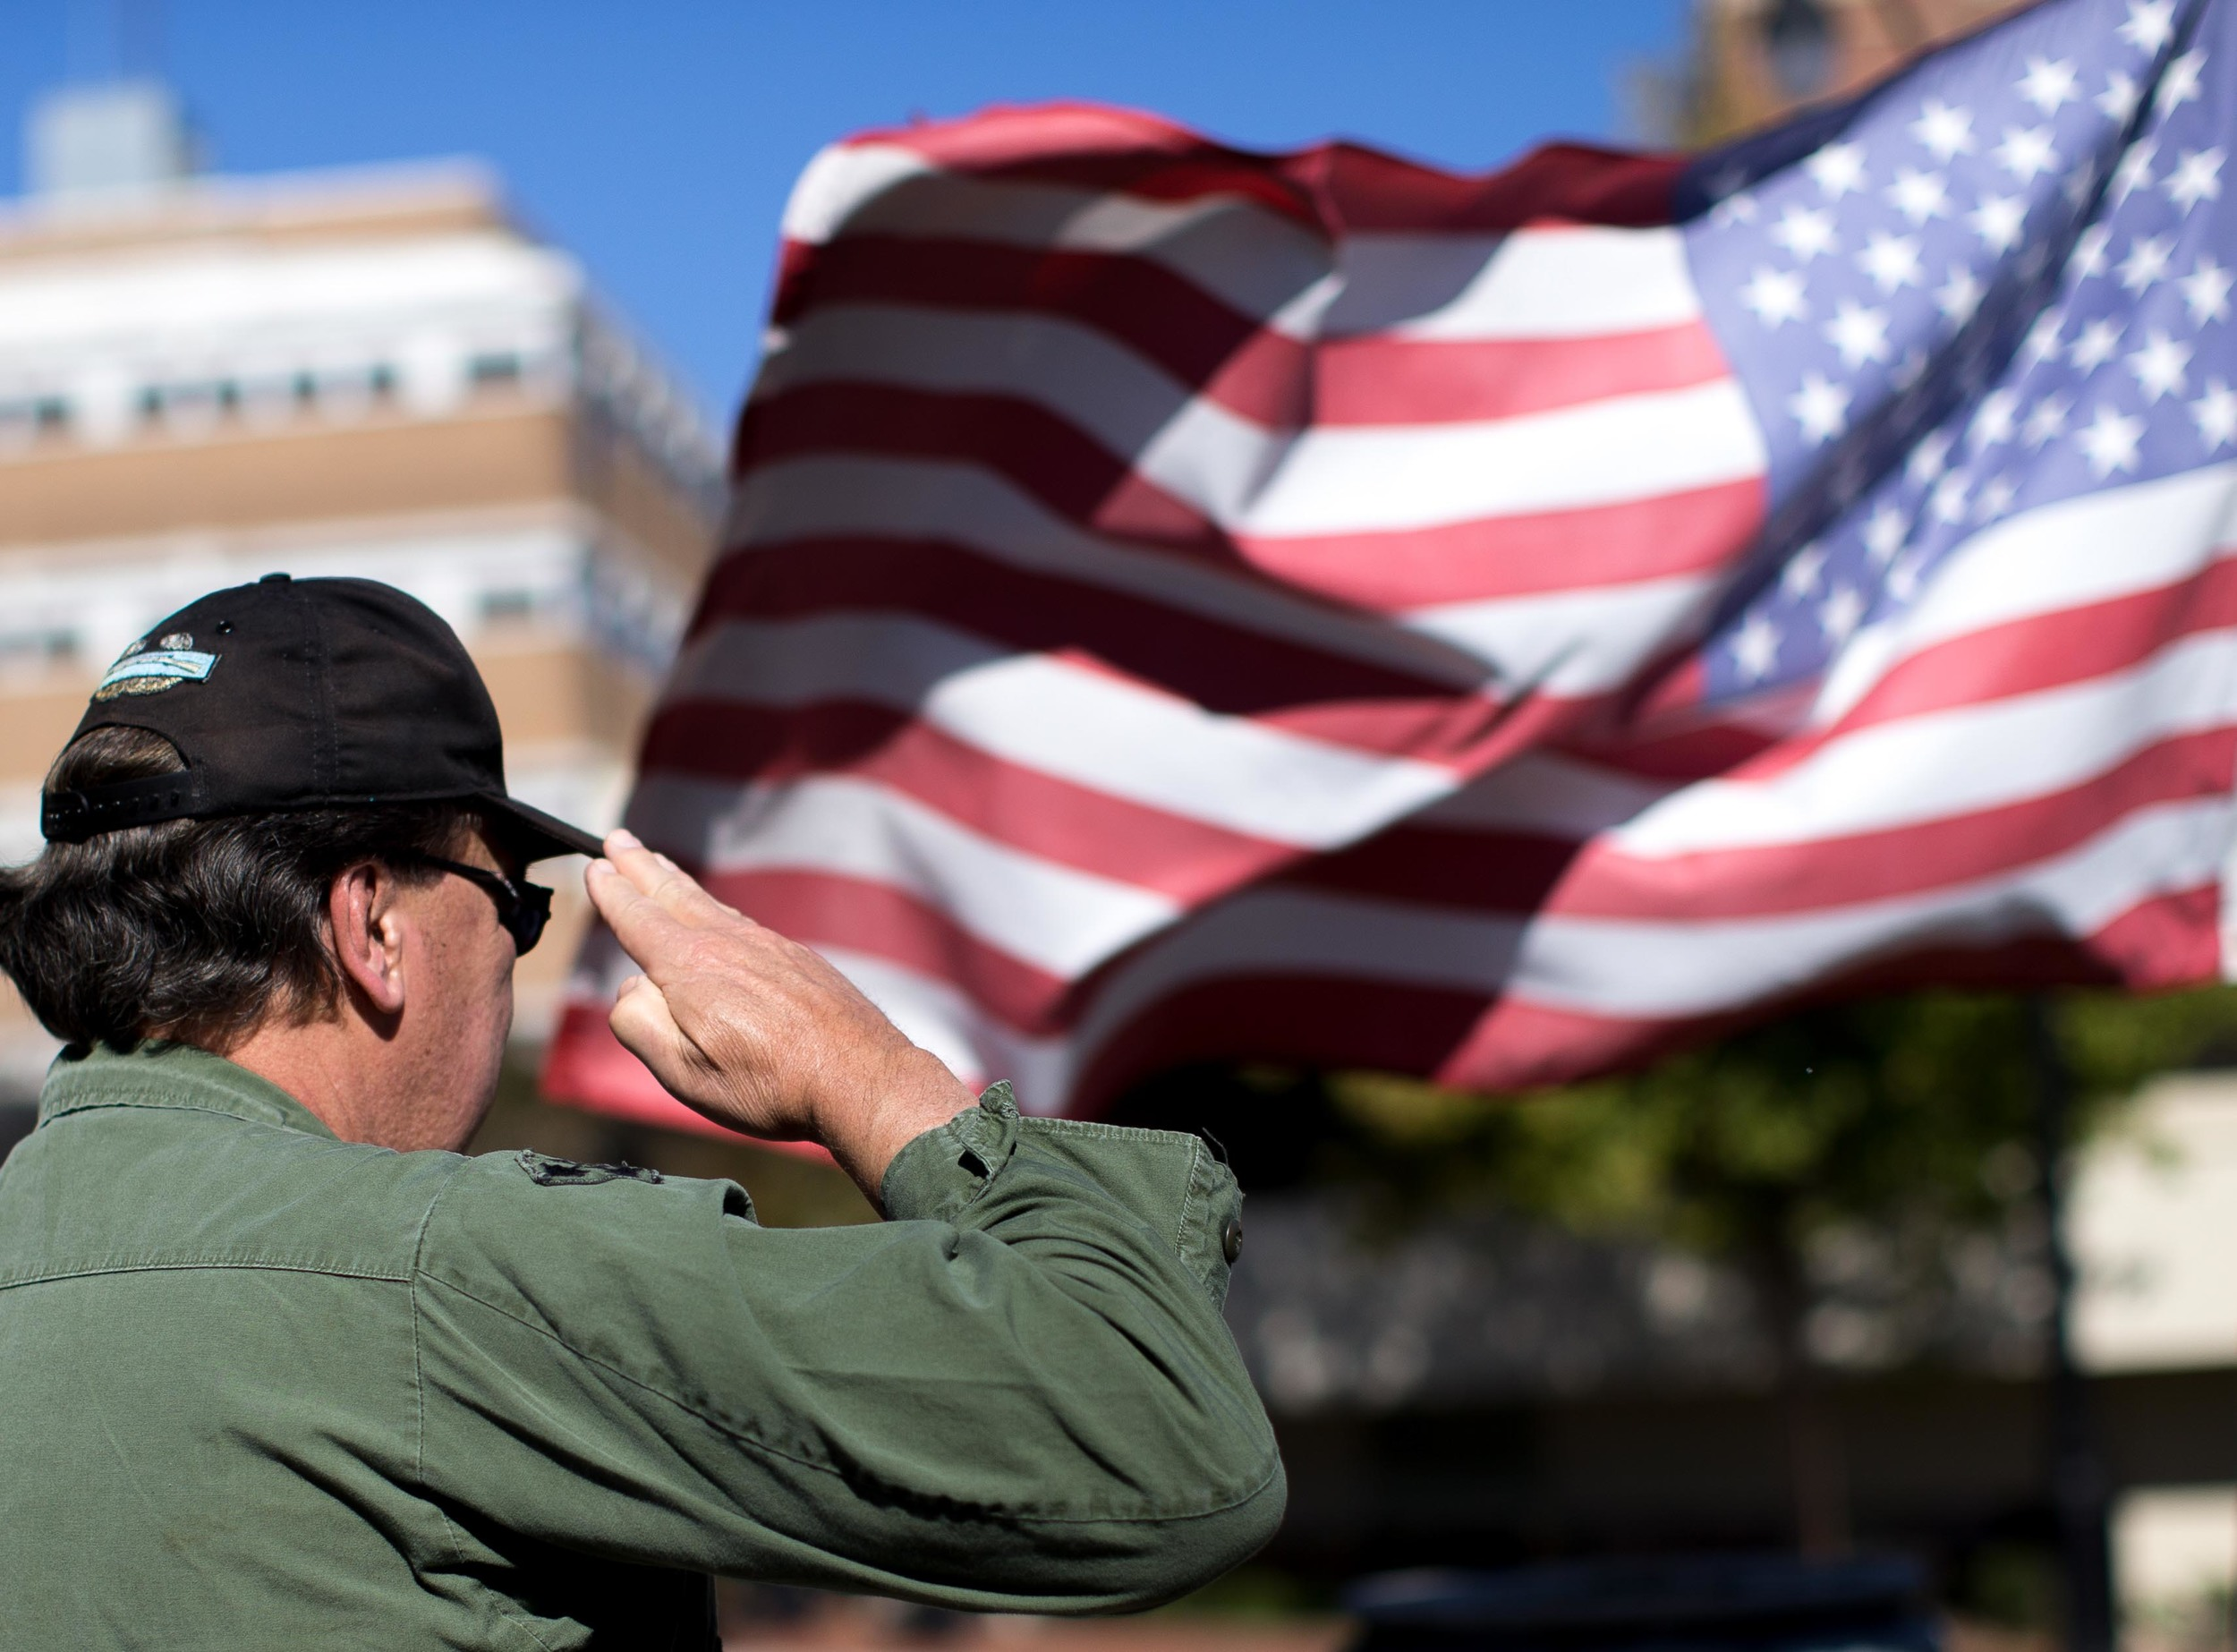 Nov. 11, 2015 - Marietta, Ga, U.S - DAVID THOMAS, a Vietnam War Army veteran, salutes during a parade on Veterans Day. Thomas deployed to Vietnam from 1970-71. (Credit Image: © Branden Camp via ZUMA Wire)